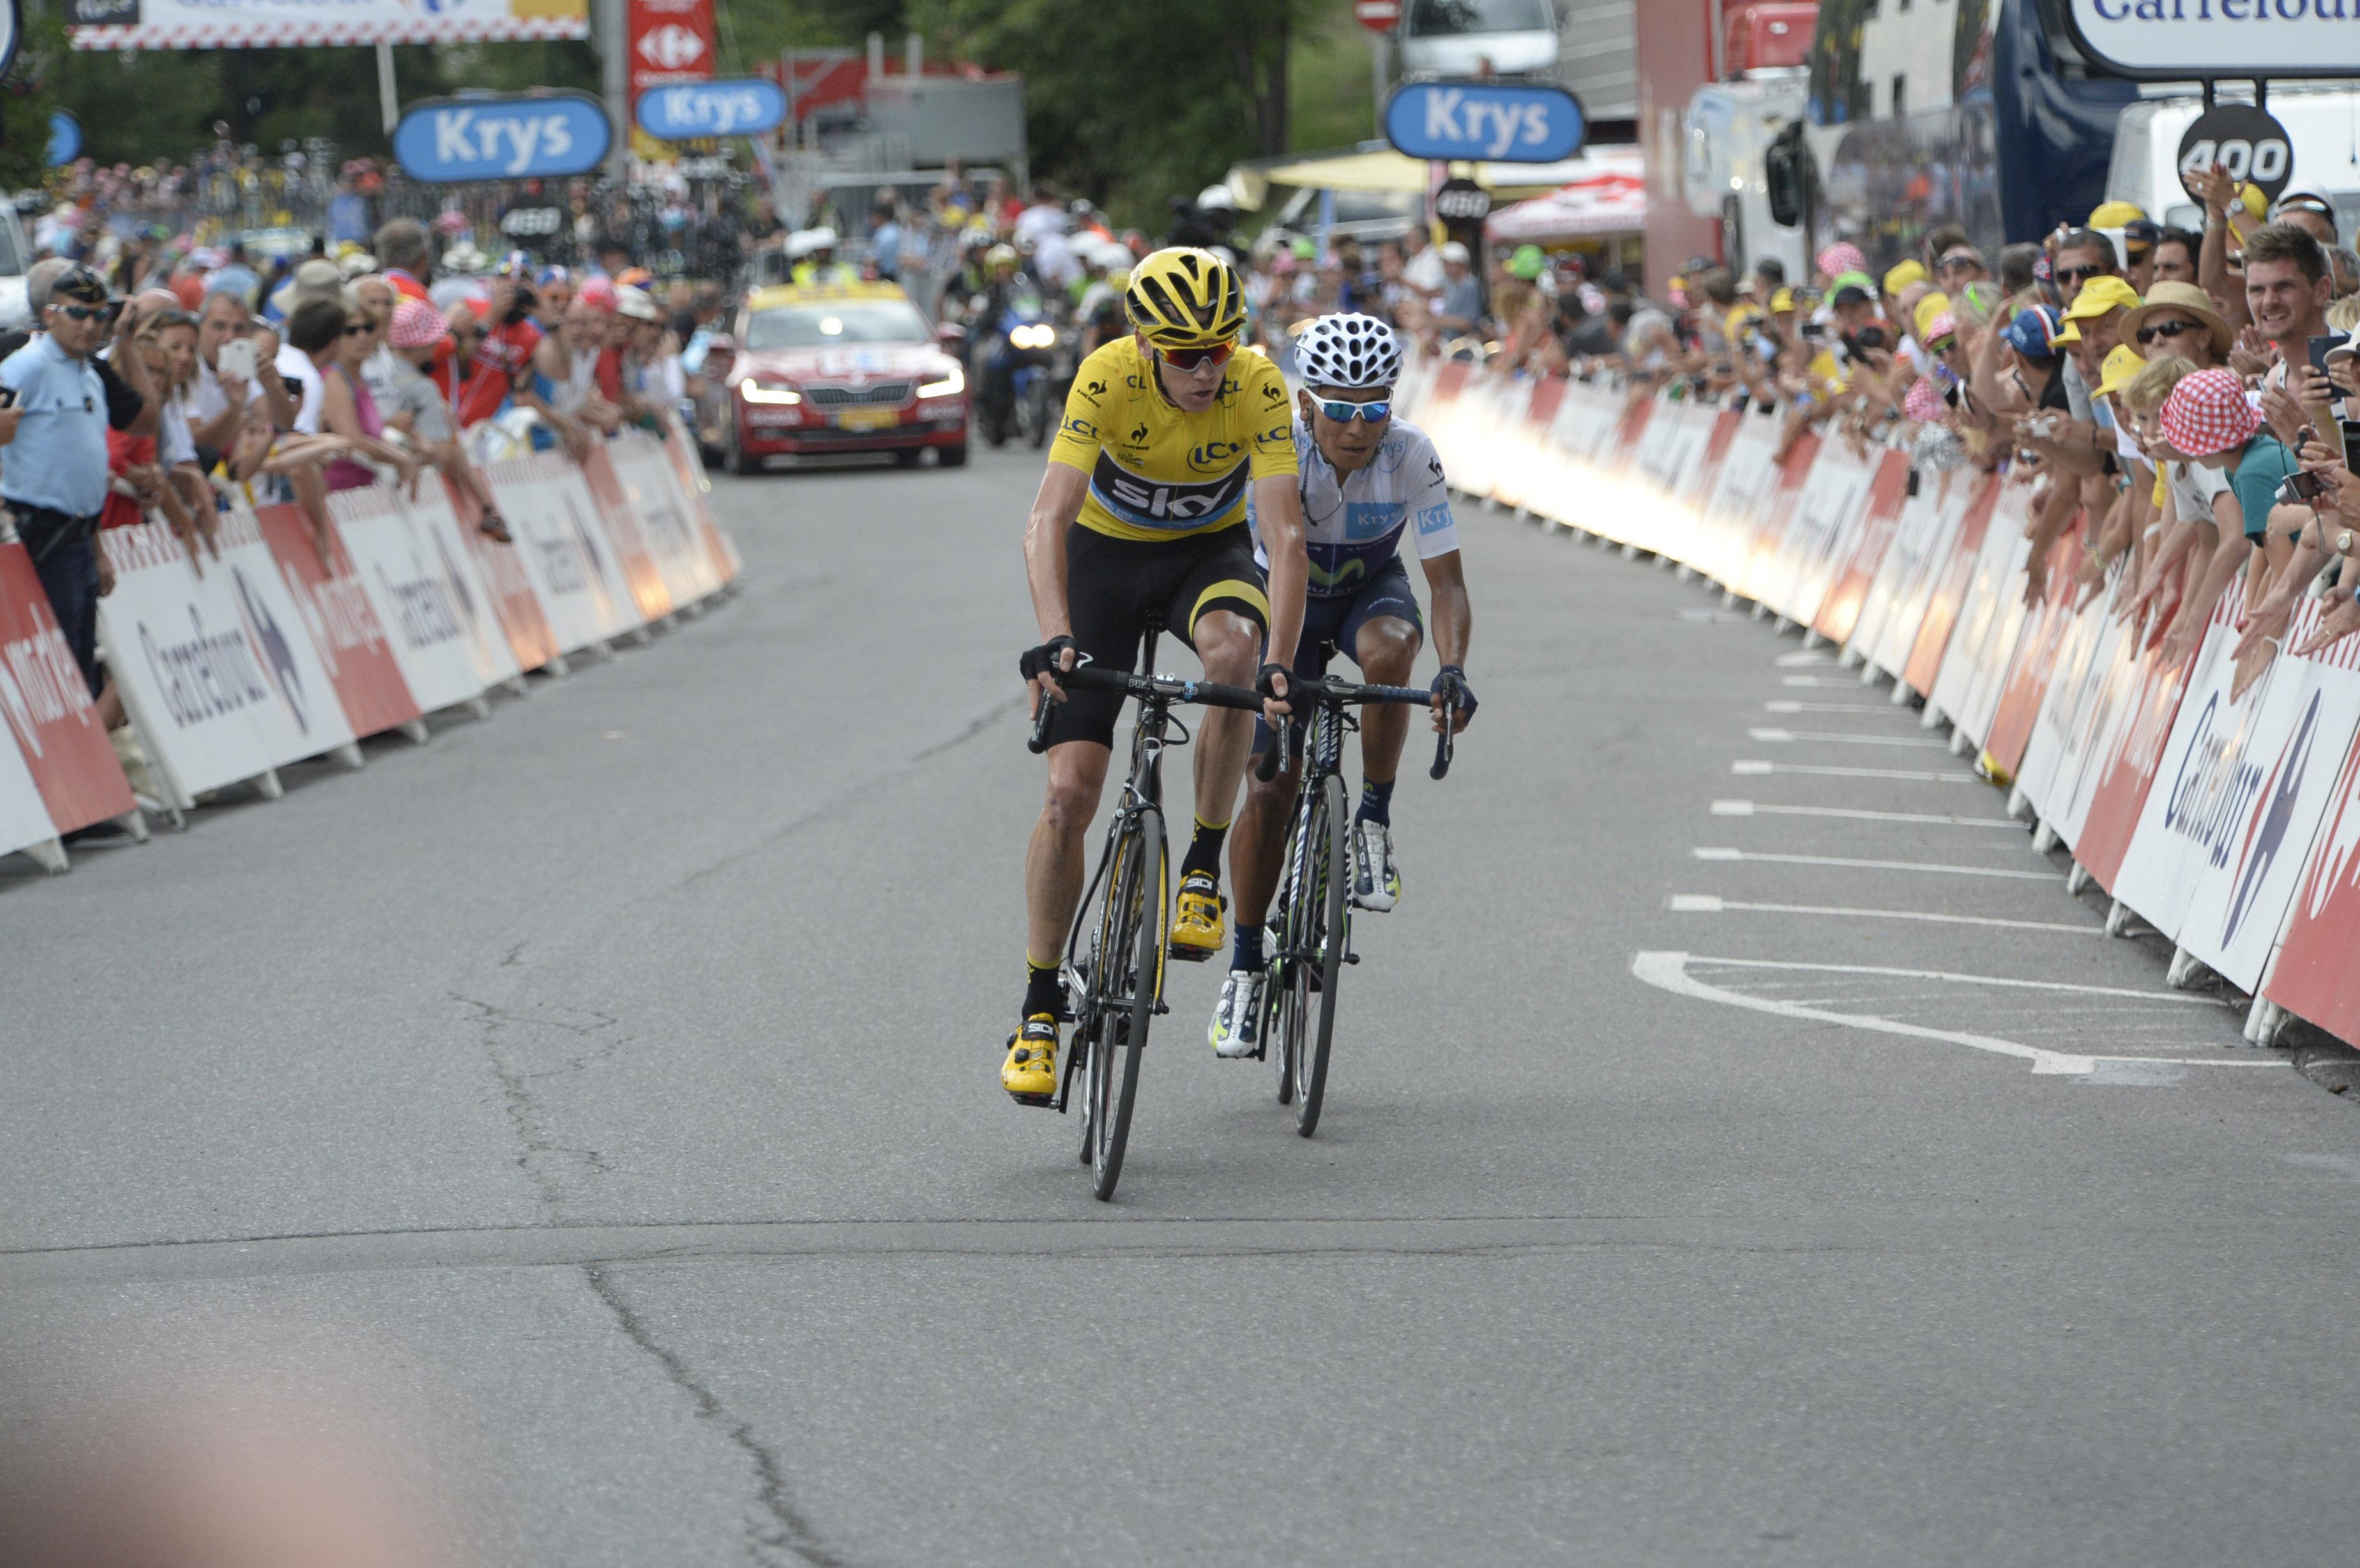 Chris Froome verteidigt sein Gelbes Trikot. (pic: Sirotti)